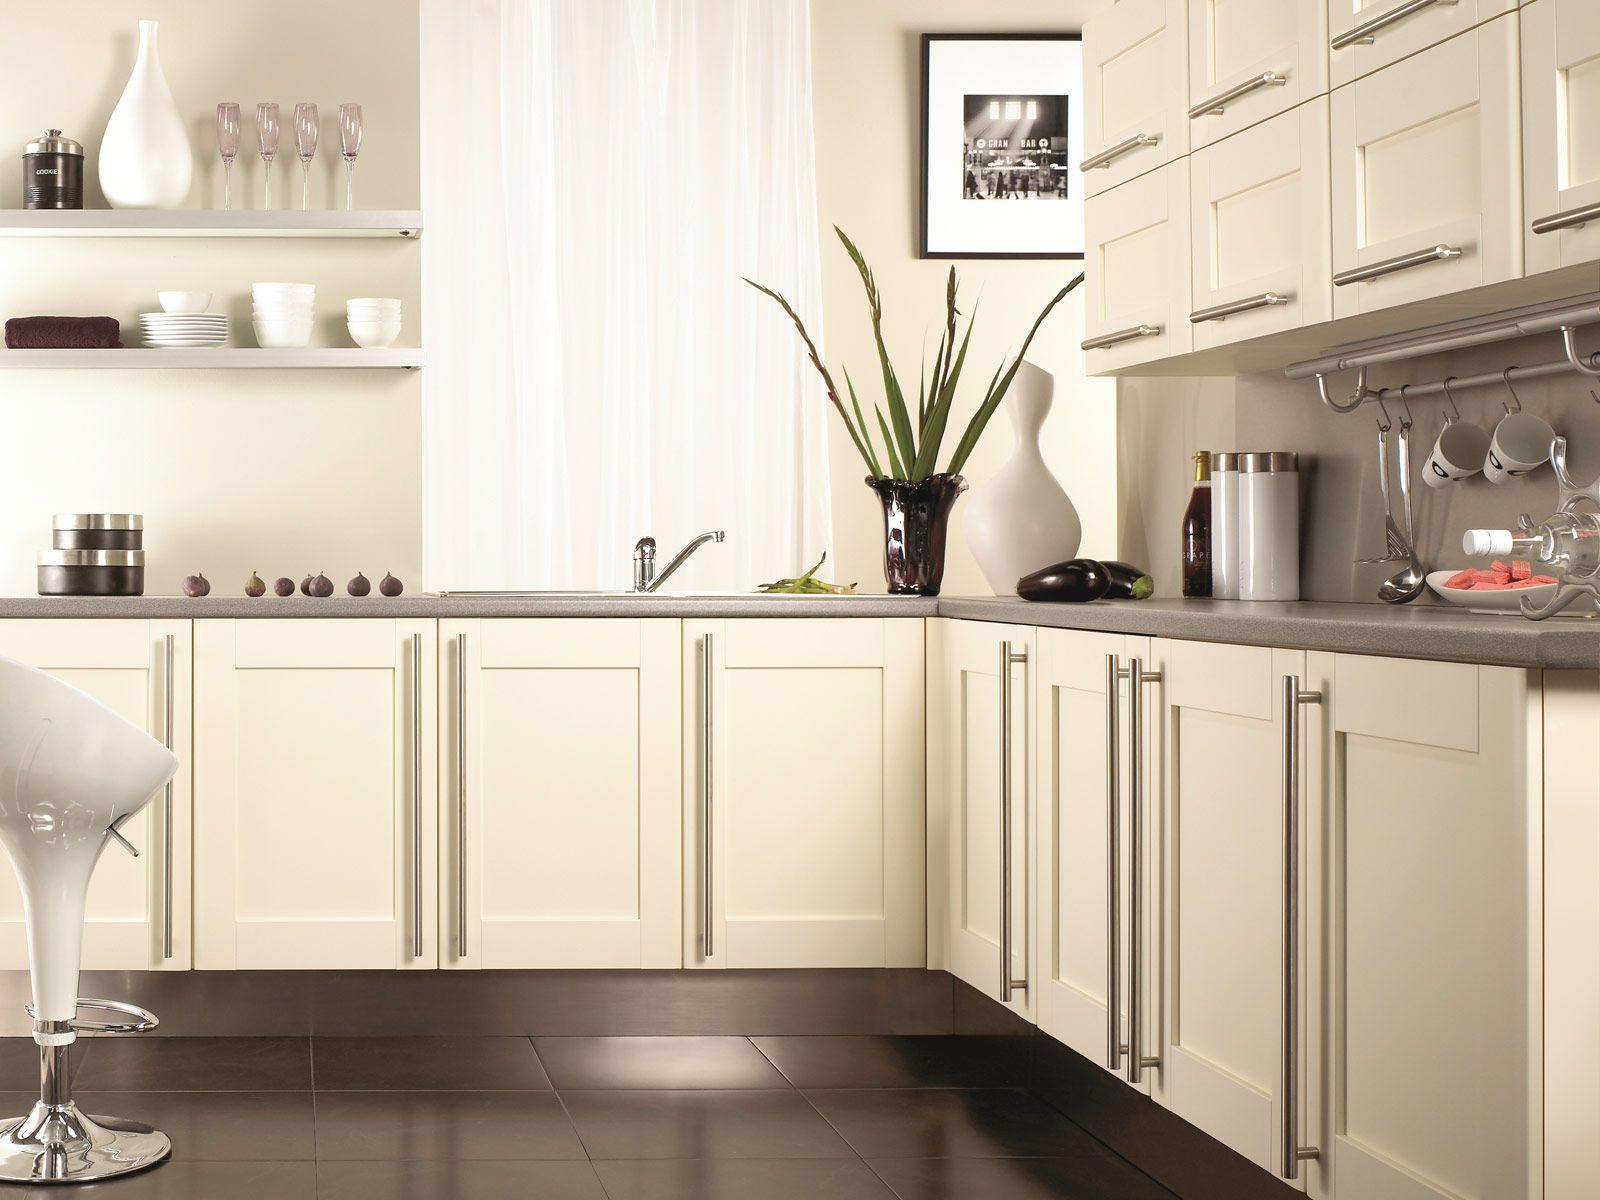 Ikea_Nz Ikea Kitchen From Nordicdesignconz Online Store Magnificent Design Your Kitchen Online Free Inspiration